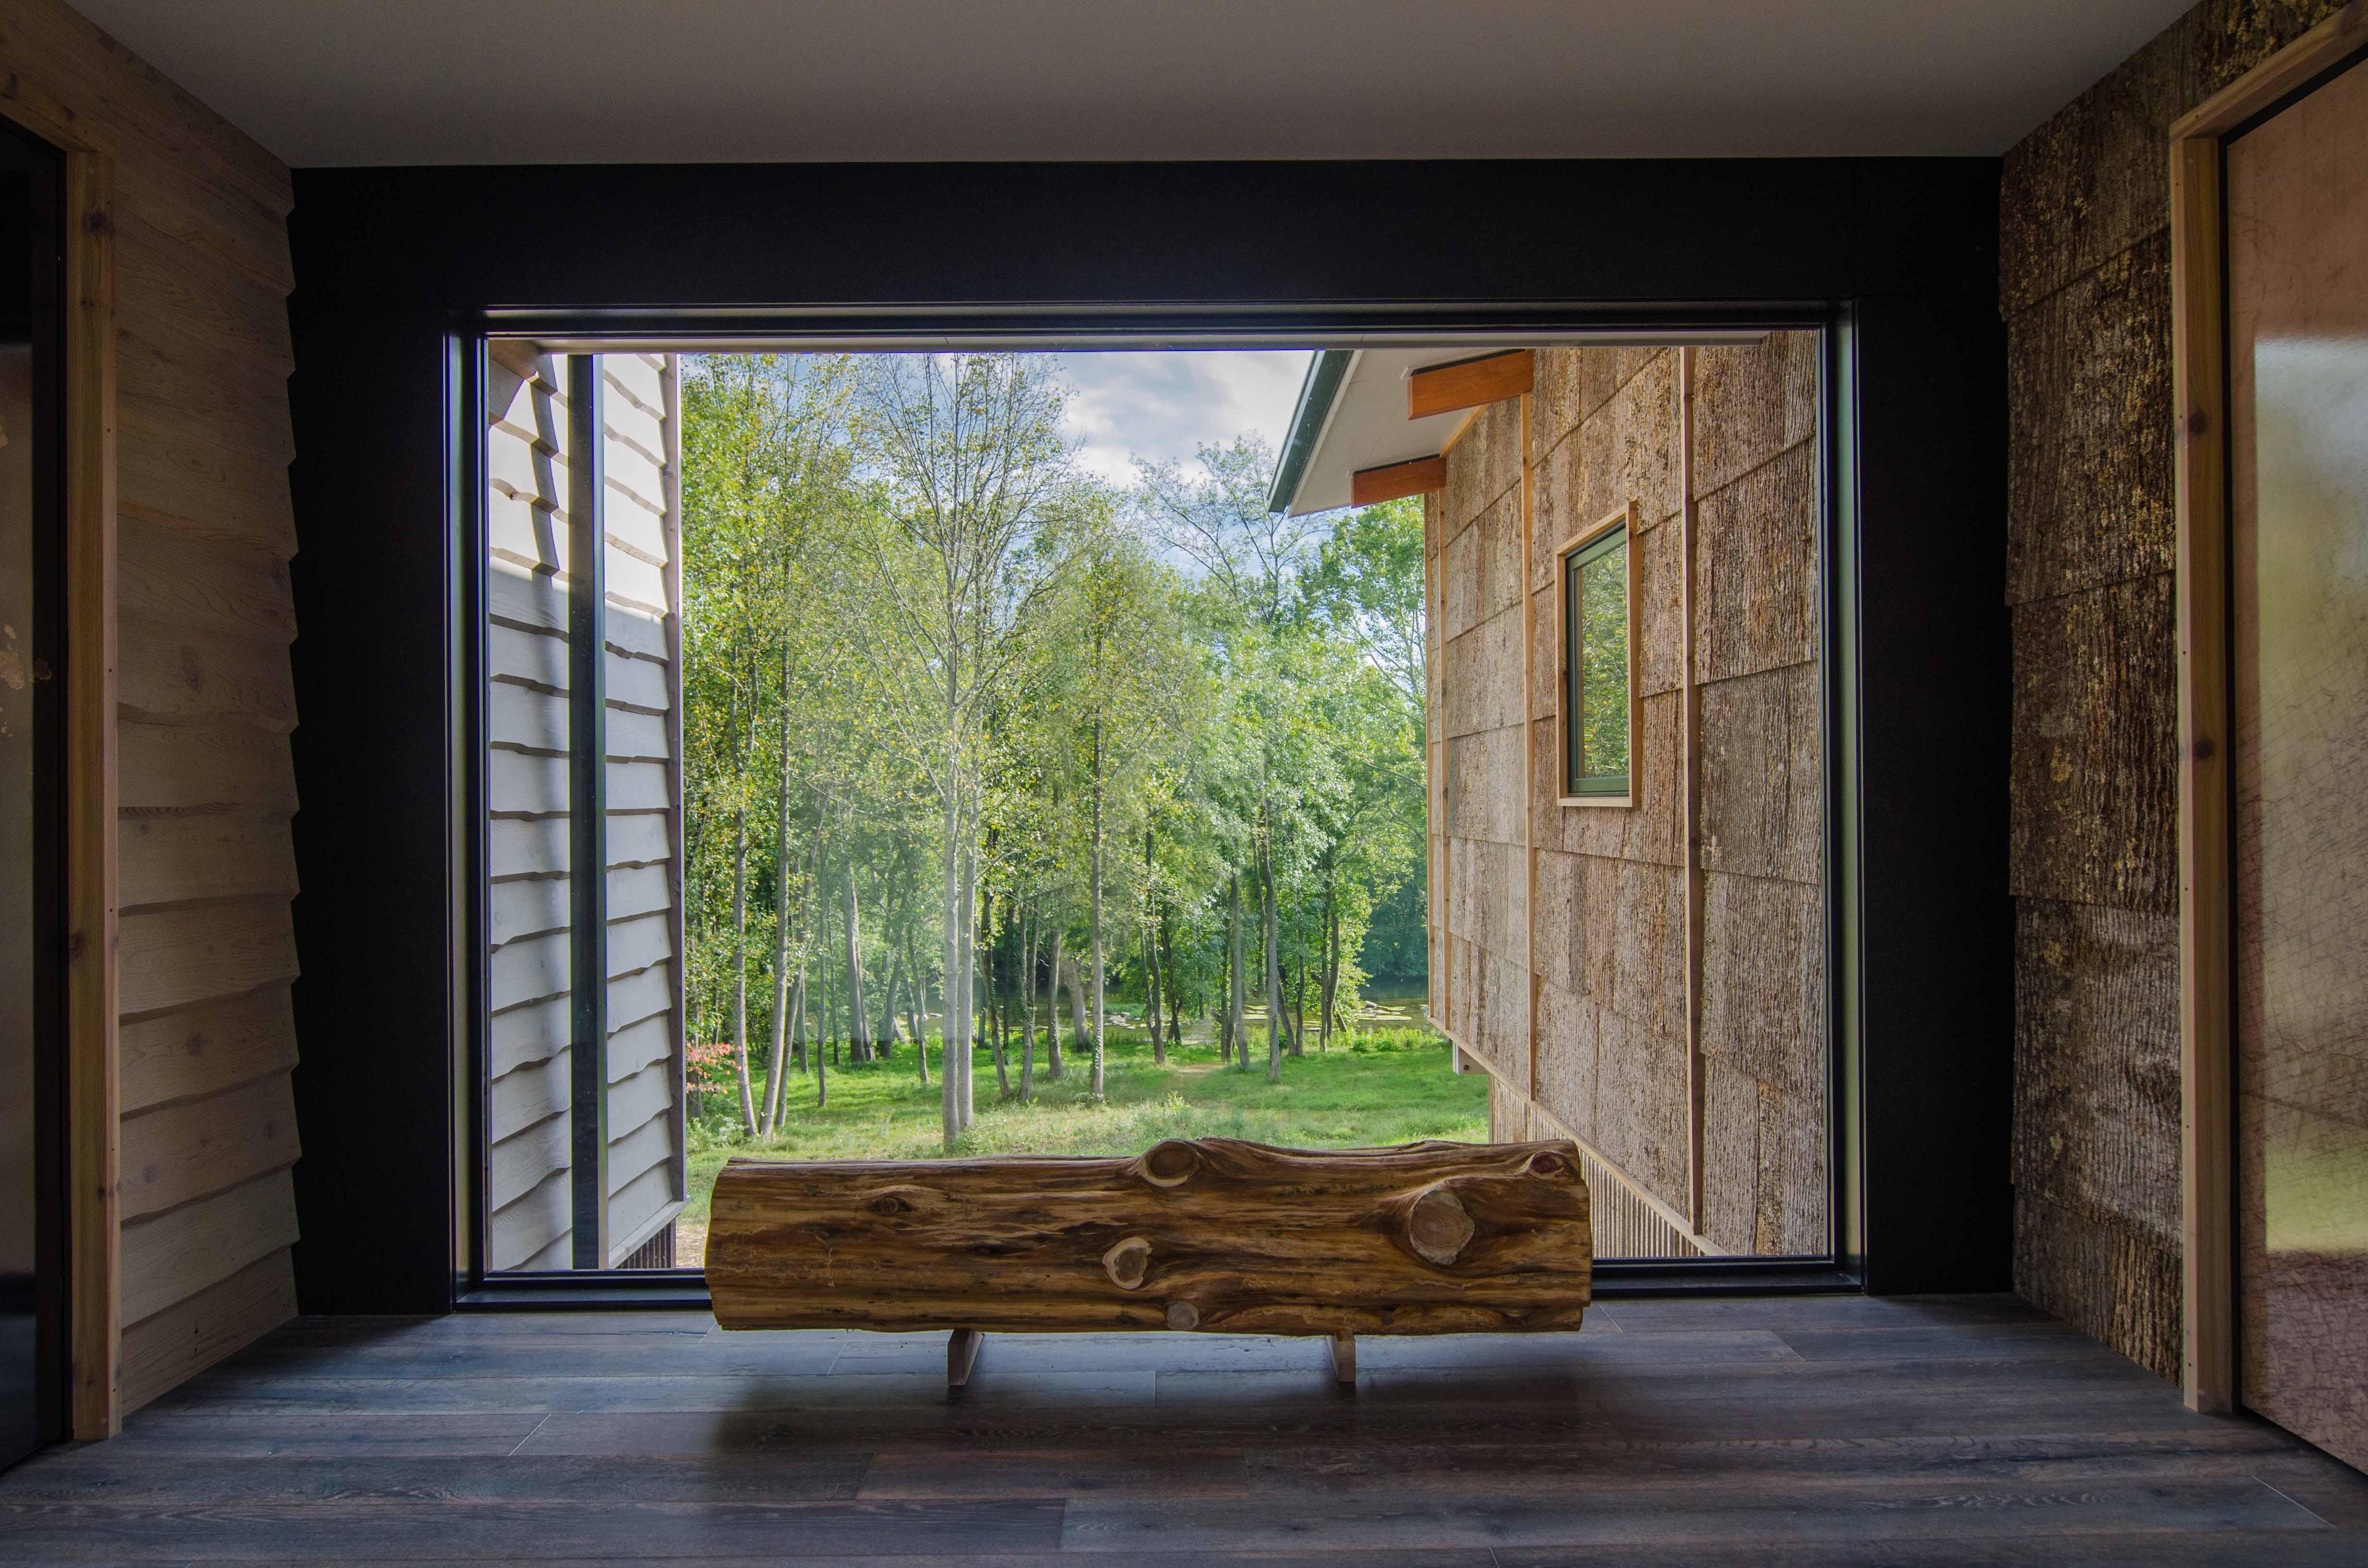 bark-house-exterior-poplar-bark-siding-Camusrory-06